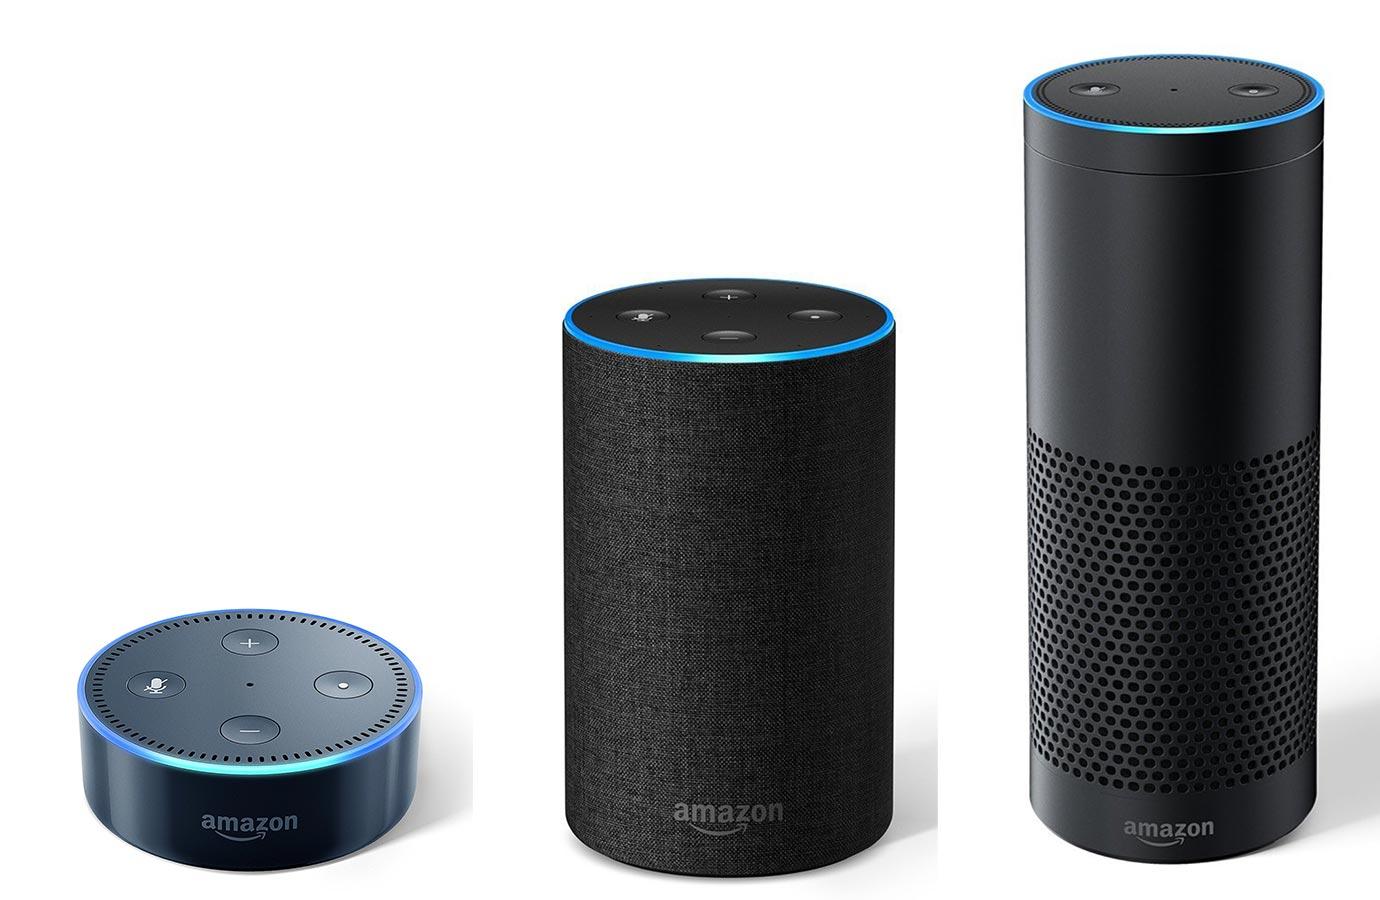 Amazon、「Amazon Echo」シリーズの一般販売を開始 ー 「Echo Dot」は期間限定で1,500円オフ